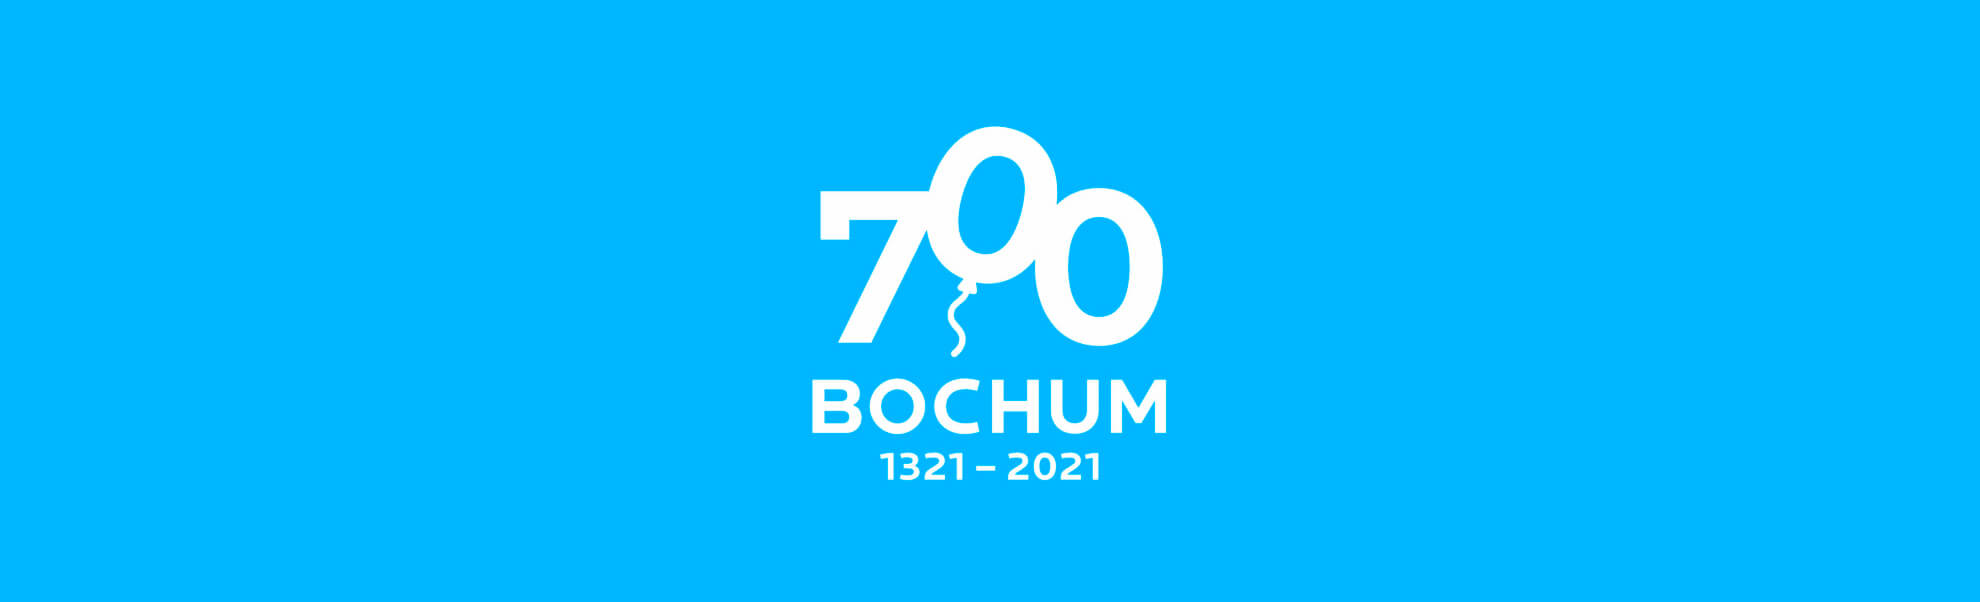 Bochum zlogo najubileusz